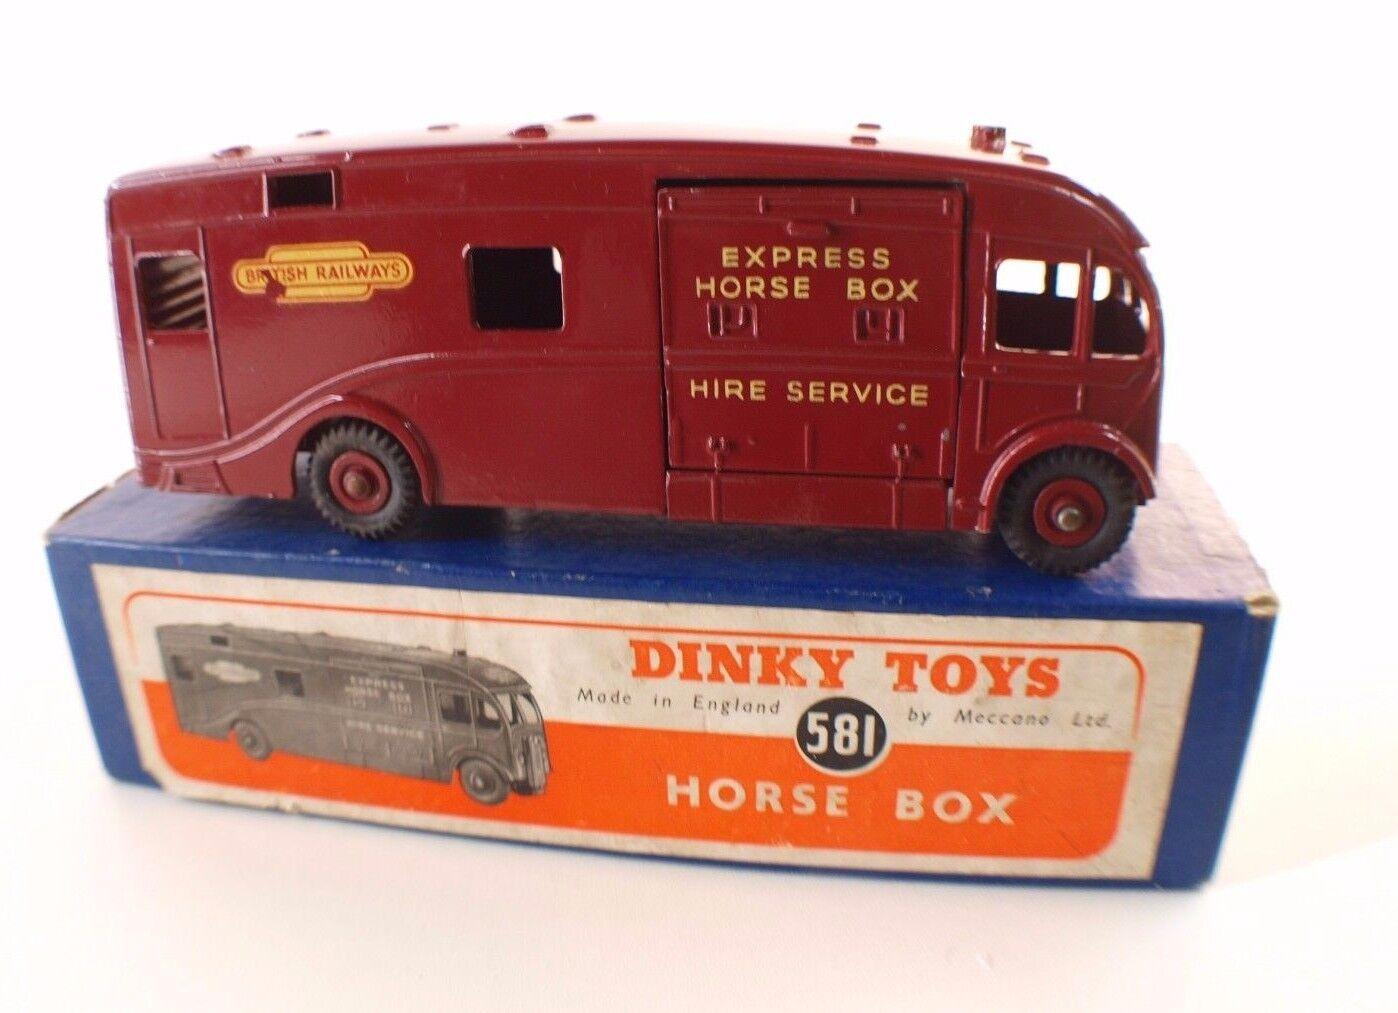 Dinky Toys GB GB GB n° 581 camion Express Horse Box British railways Truck mint RARE   Bonne Réputation Over The World  0a7ef7